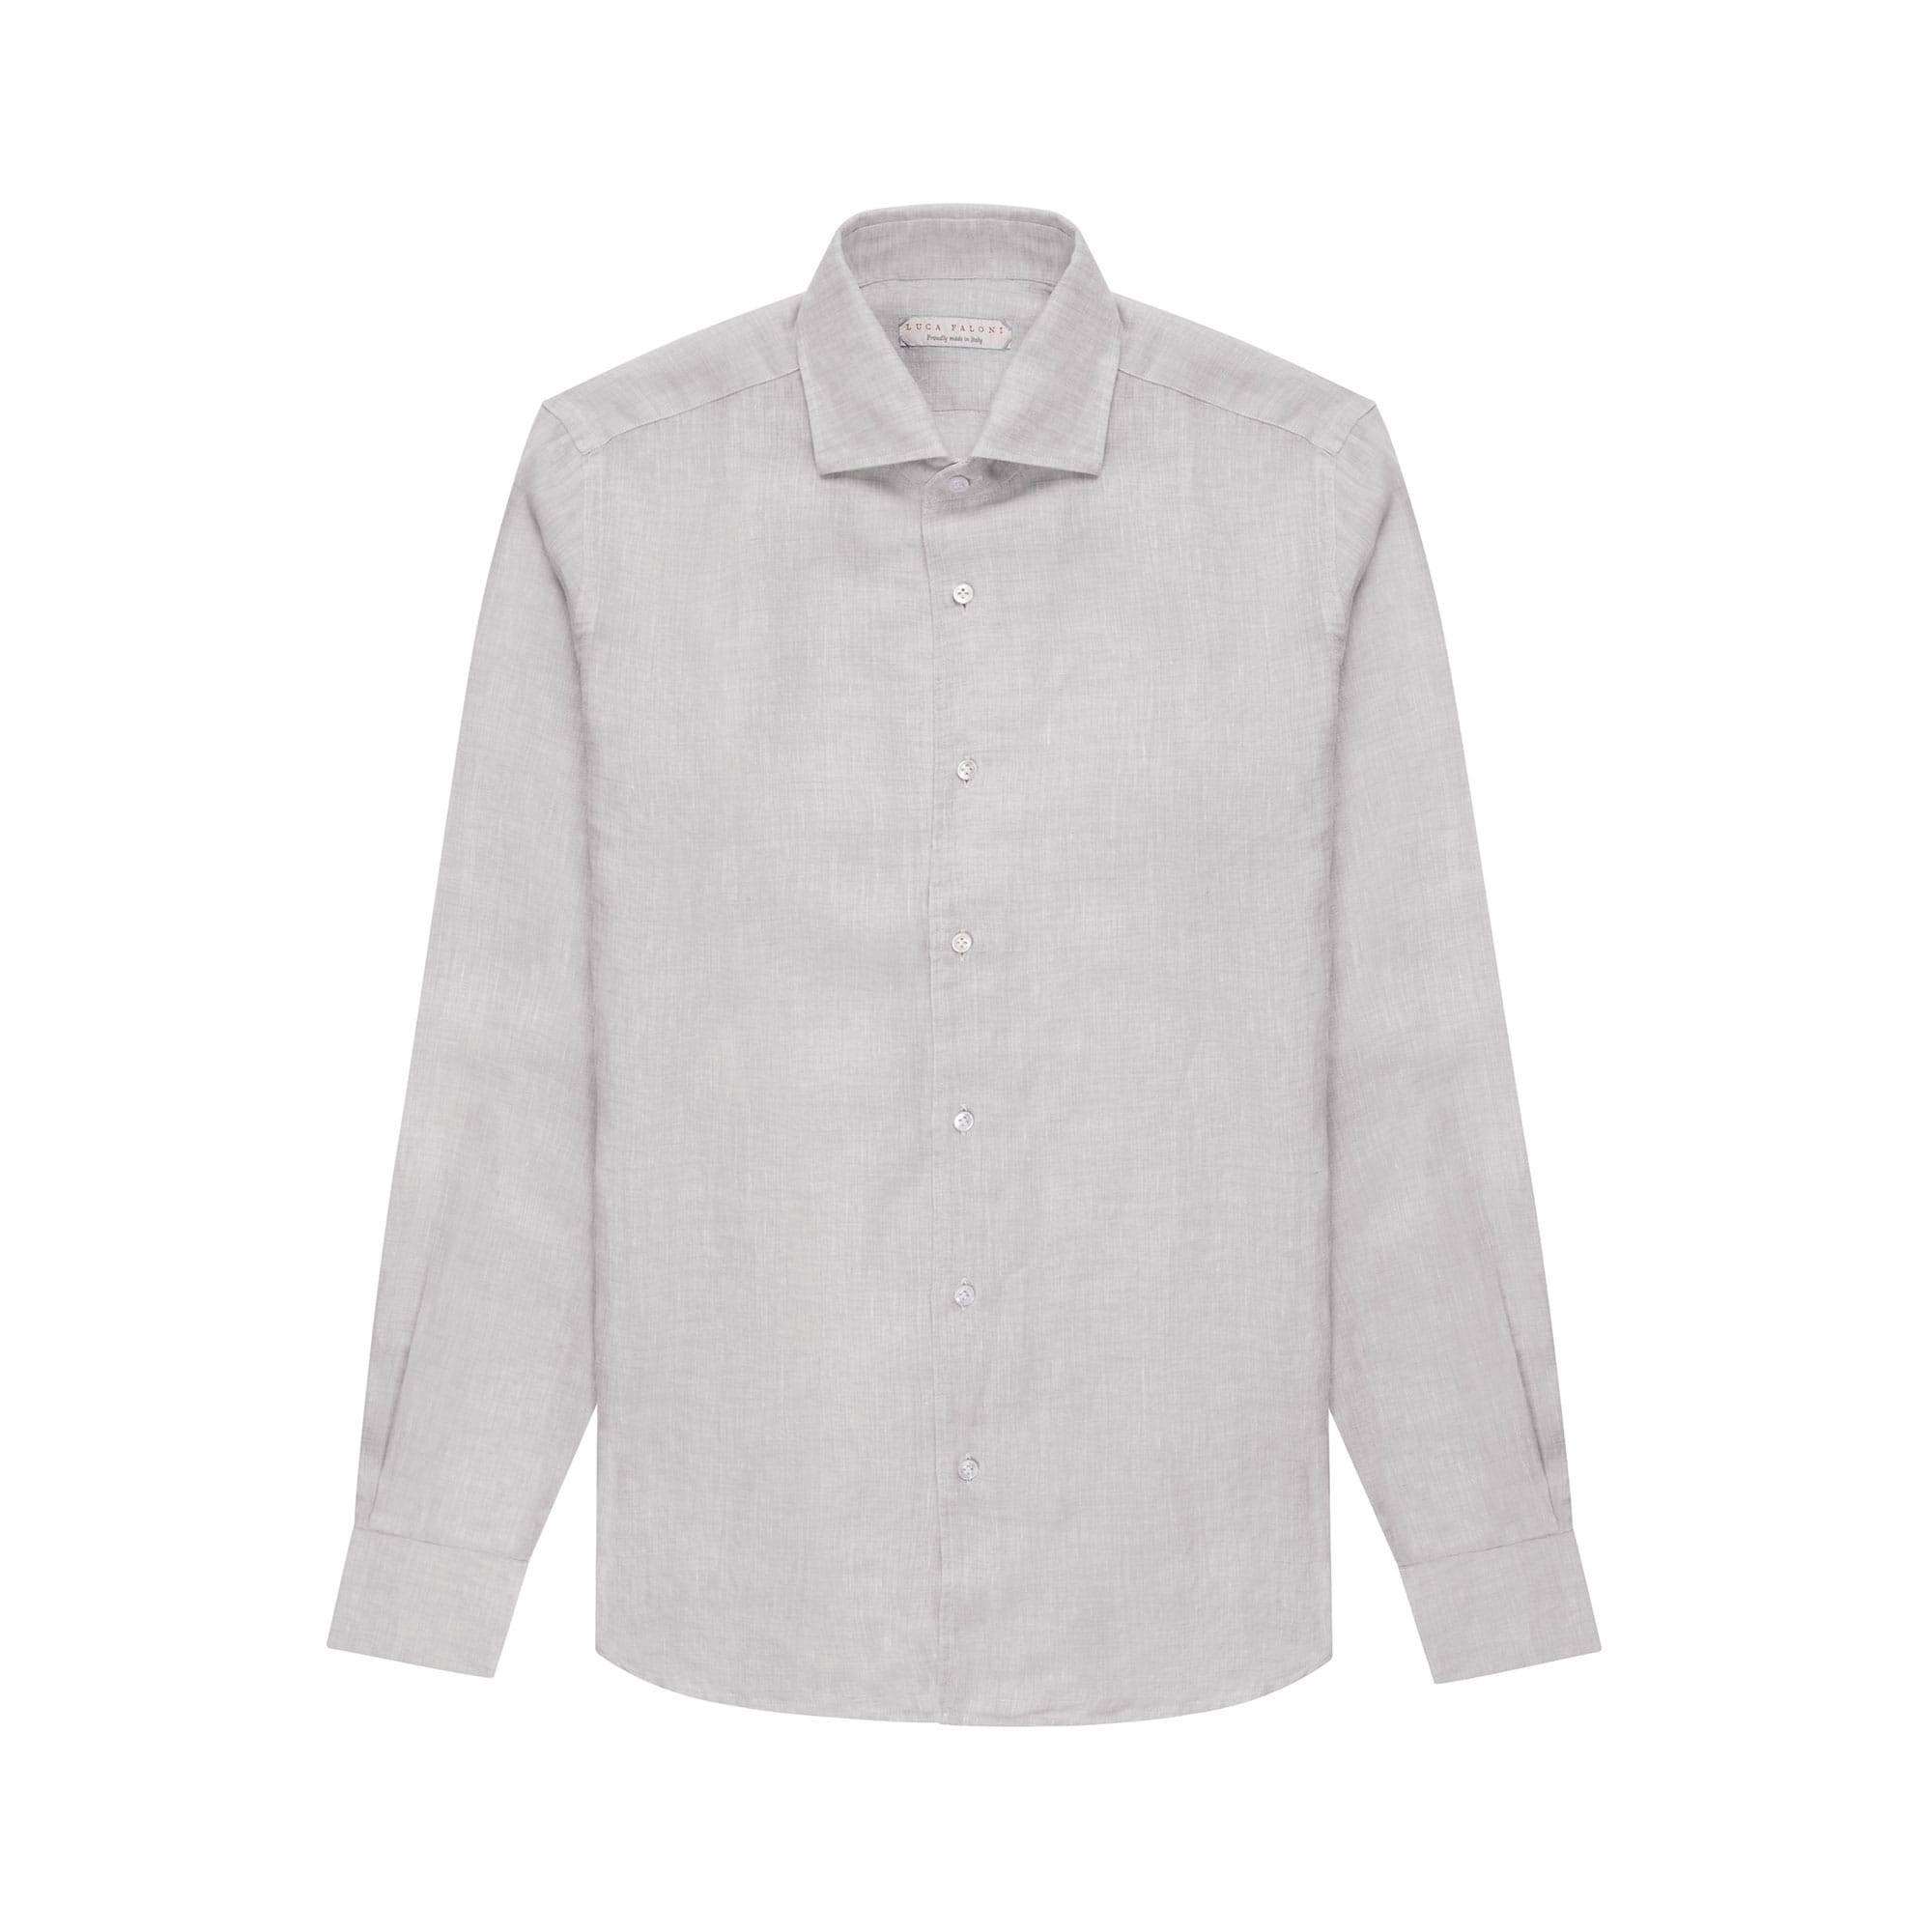 Luca Faloni Light Grey Portofino Linen Shirt Made in Italy